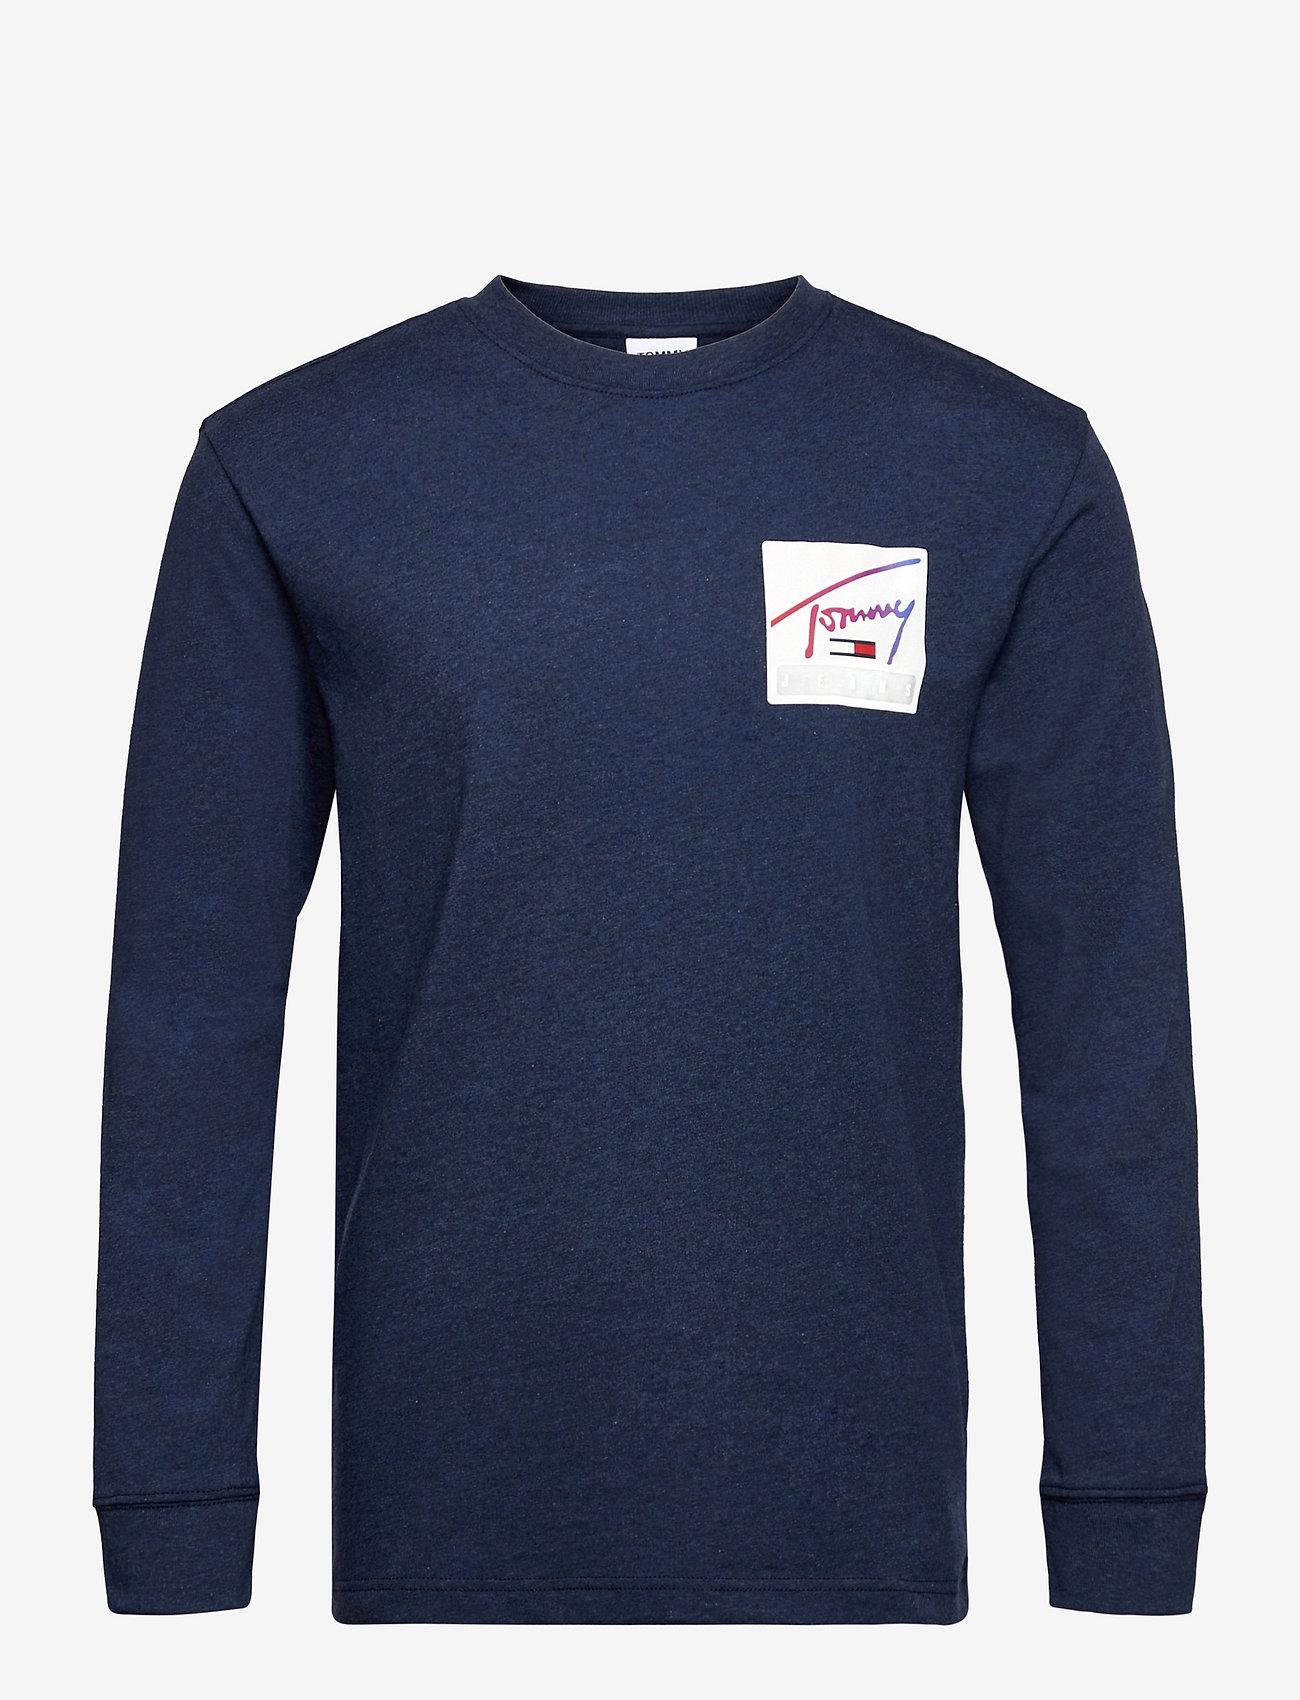 Tommy Jeans - TJM TOMMY BASKETBALL LONGSLEEVE - basic t-shirts - twilight navy - 0